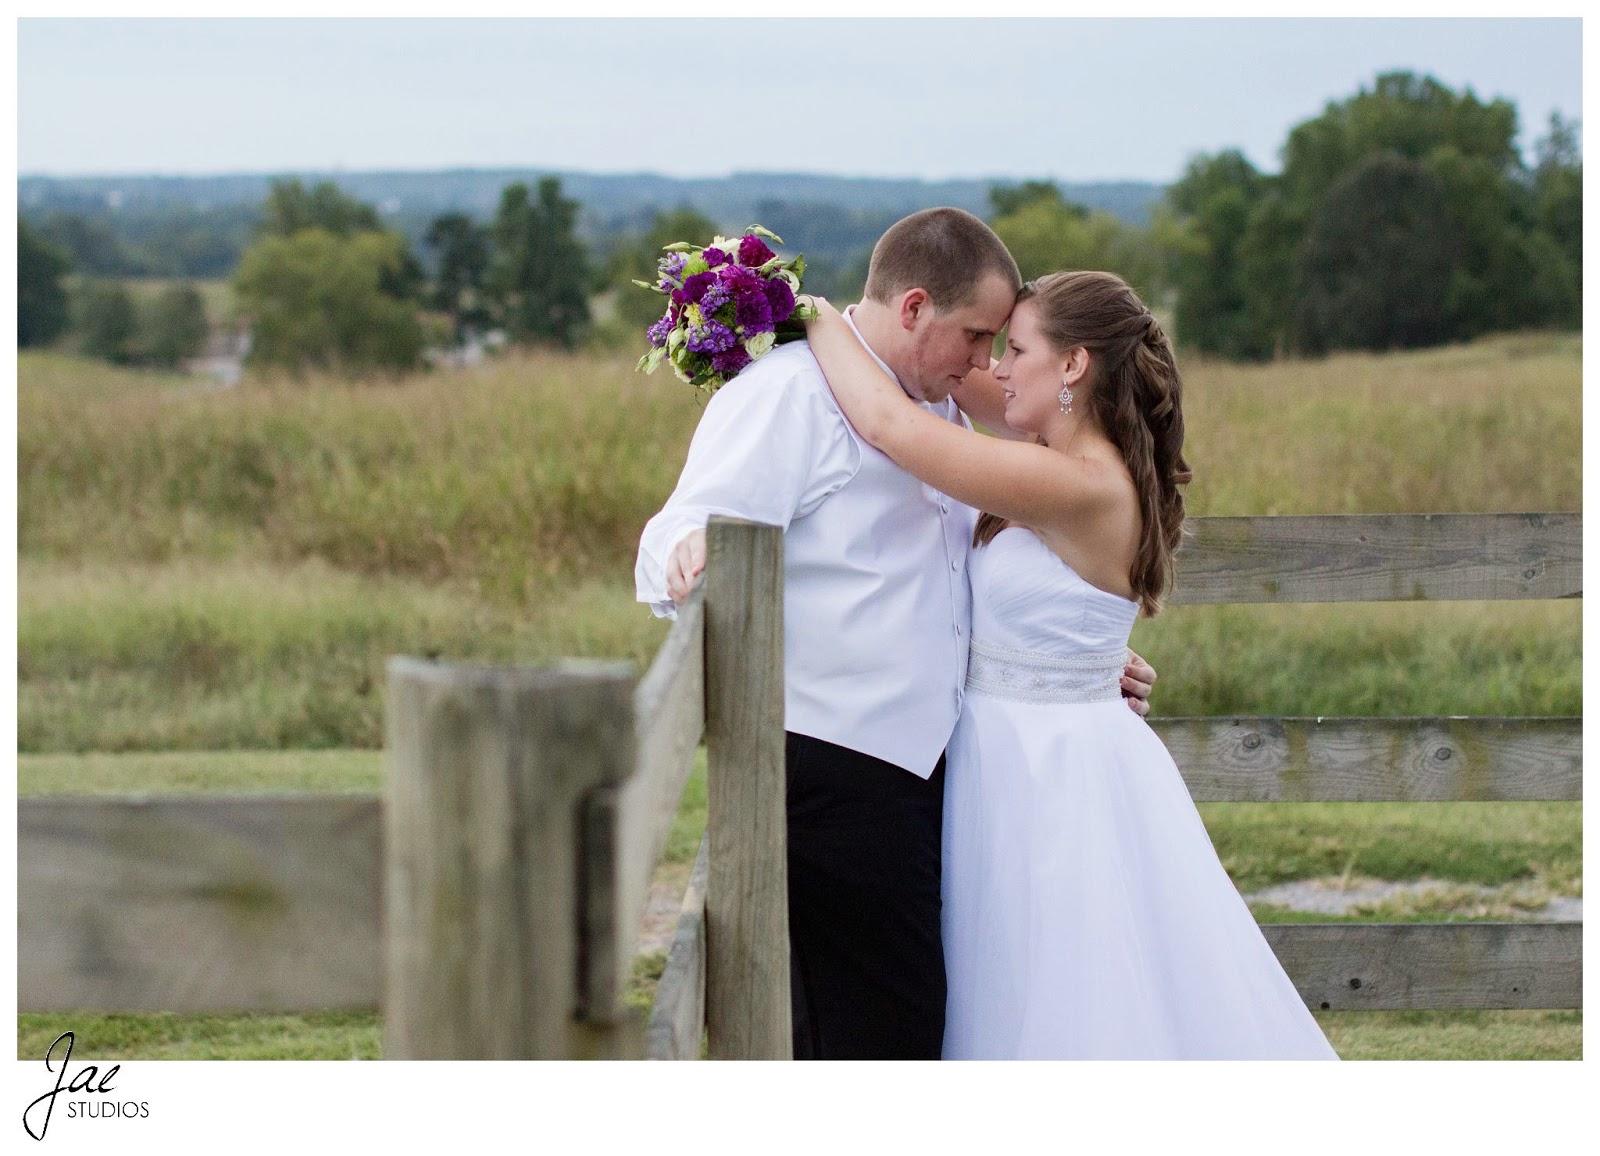 Jonathan and Julie, Bird cage, West Manor Estate, Wedding, Lynchburg, Virginia, Jae Studios, wedding dress, flowers, bouquet, purple, tuxedo, hugging, wooden fence